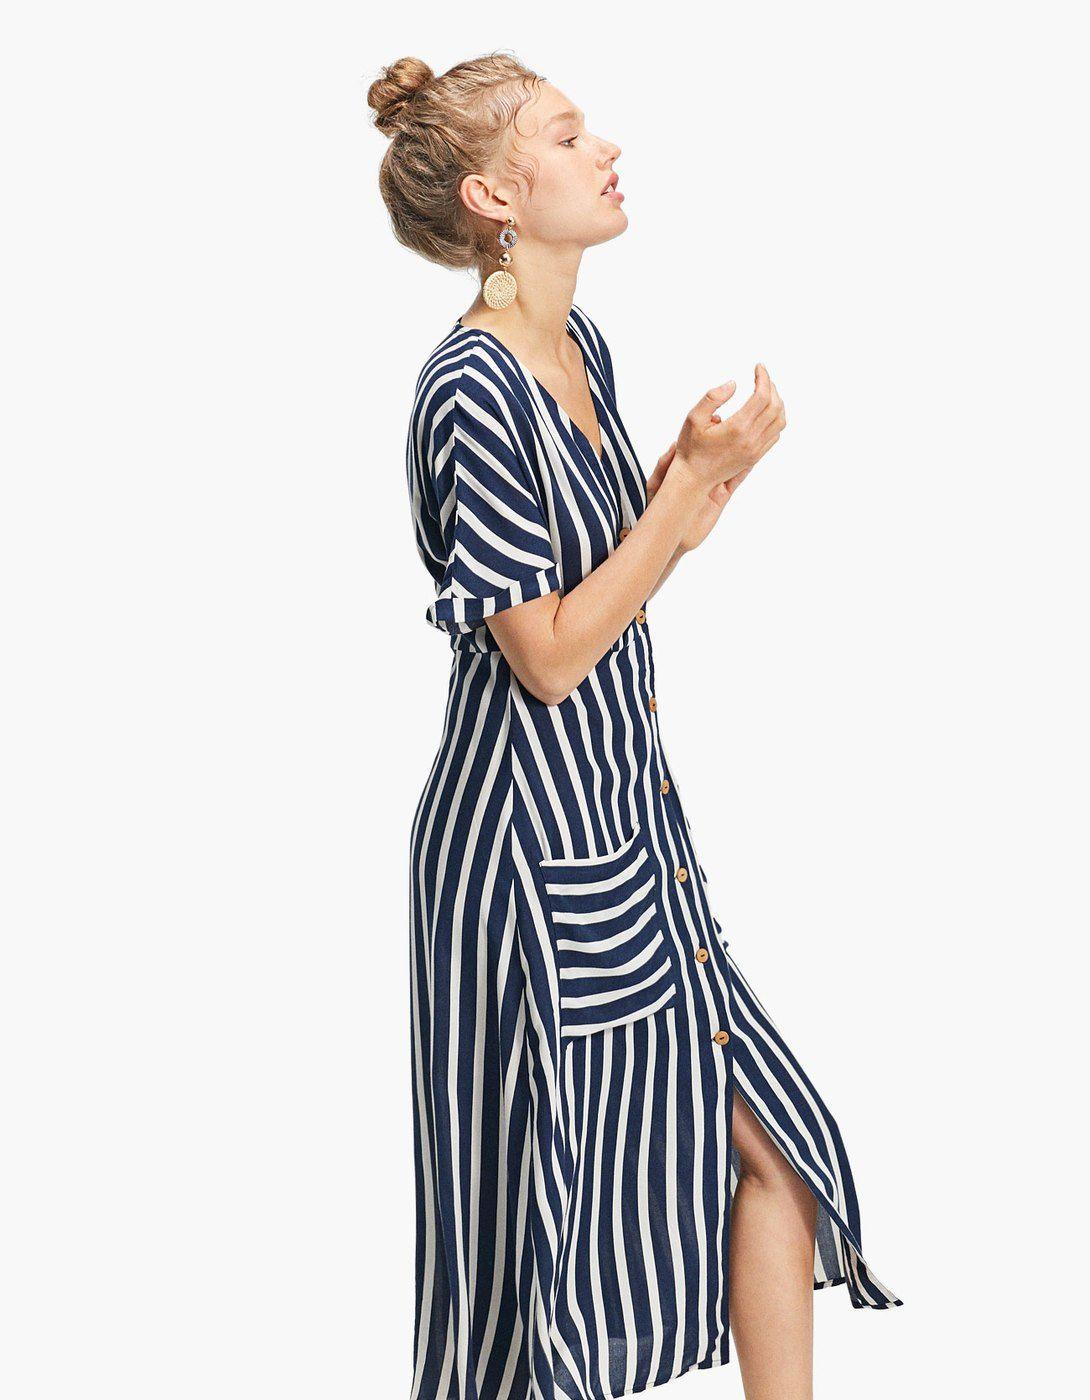 925a8ca77c5f Ριγέ φόρεμα σεμιζιέ με κουμπιά - Φορεματα | Stradivarius Greek ...